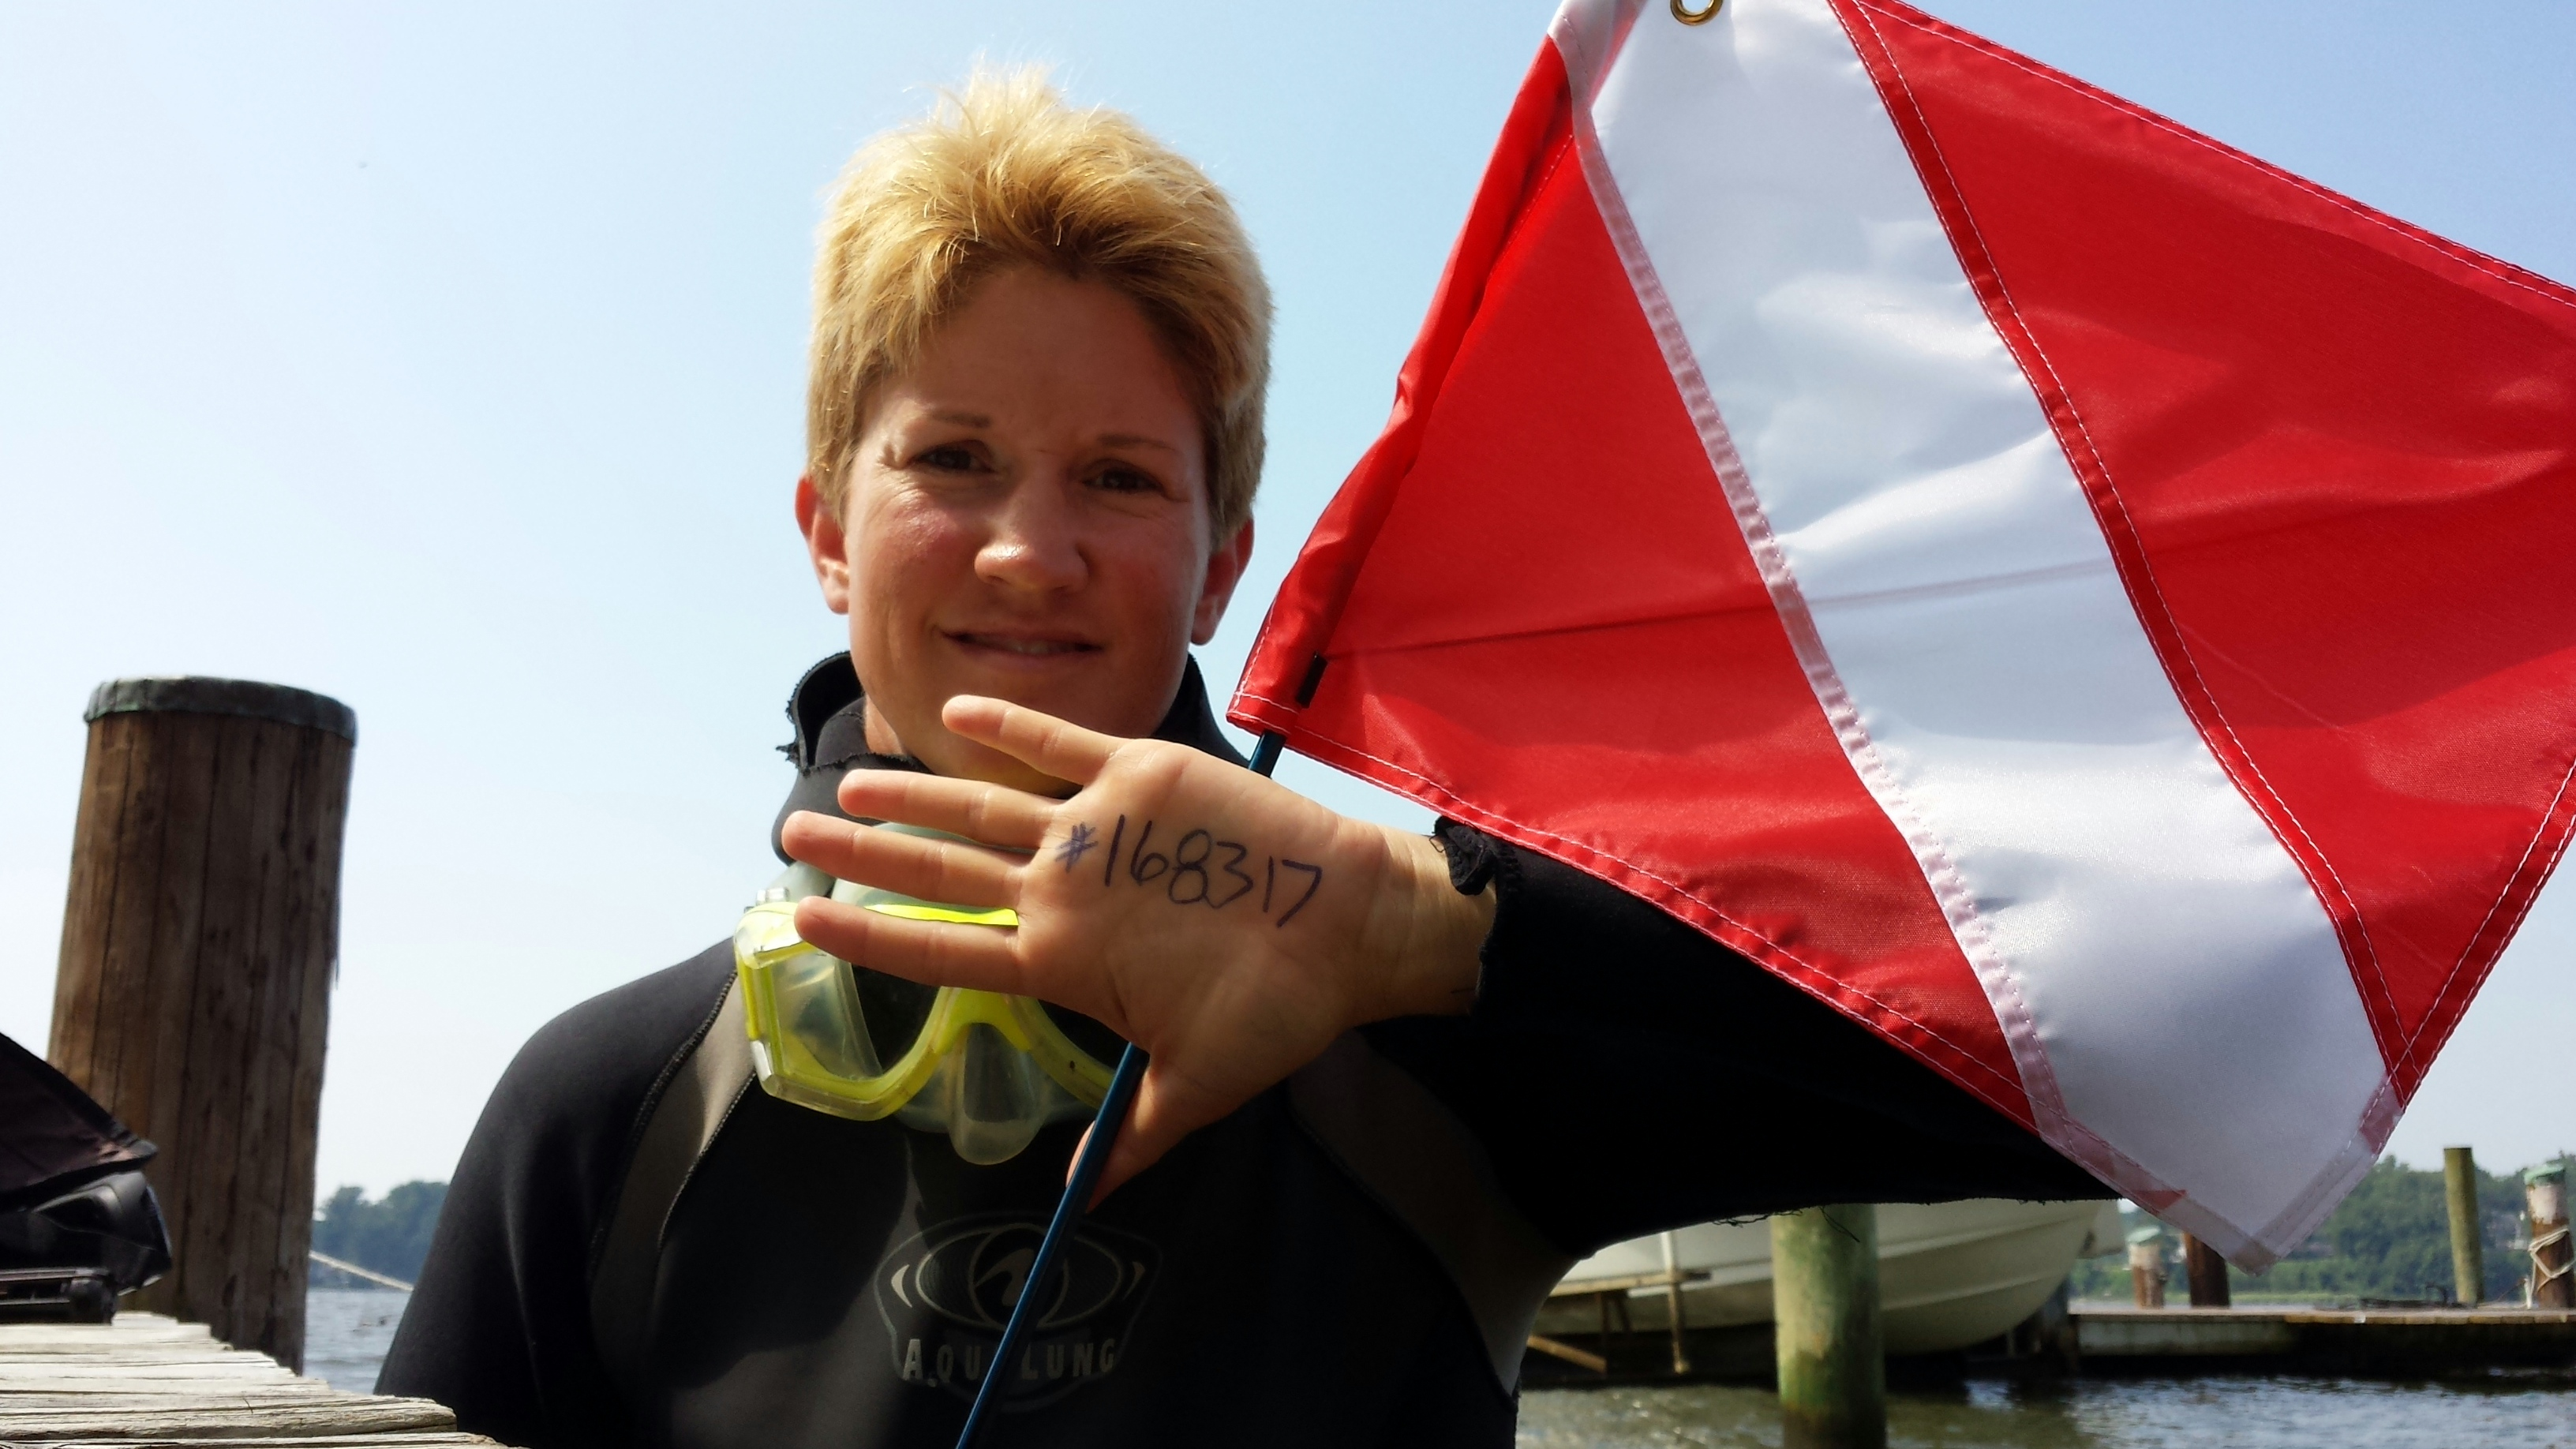 Ann Aroundel Dive, MS